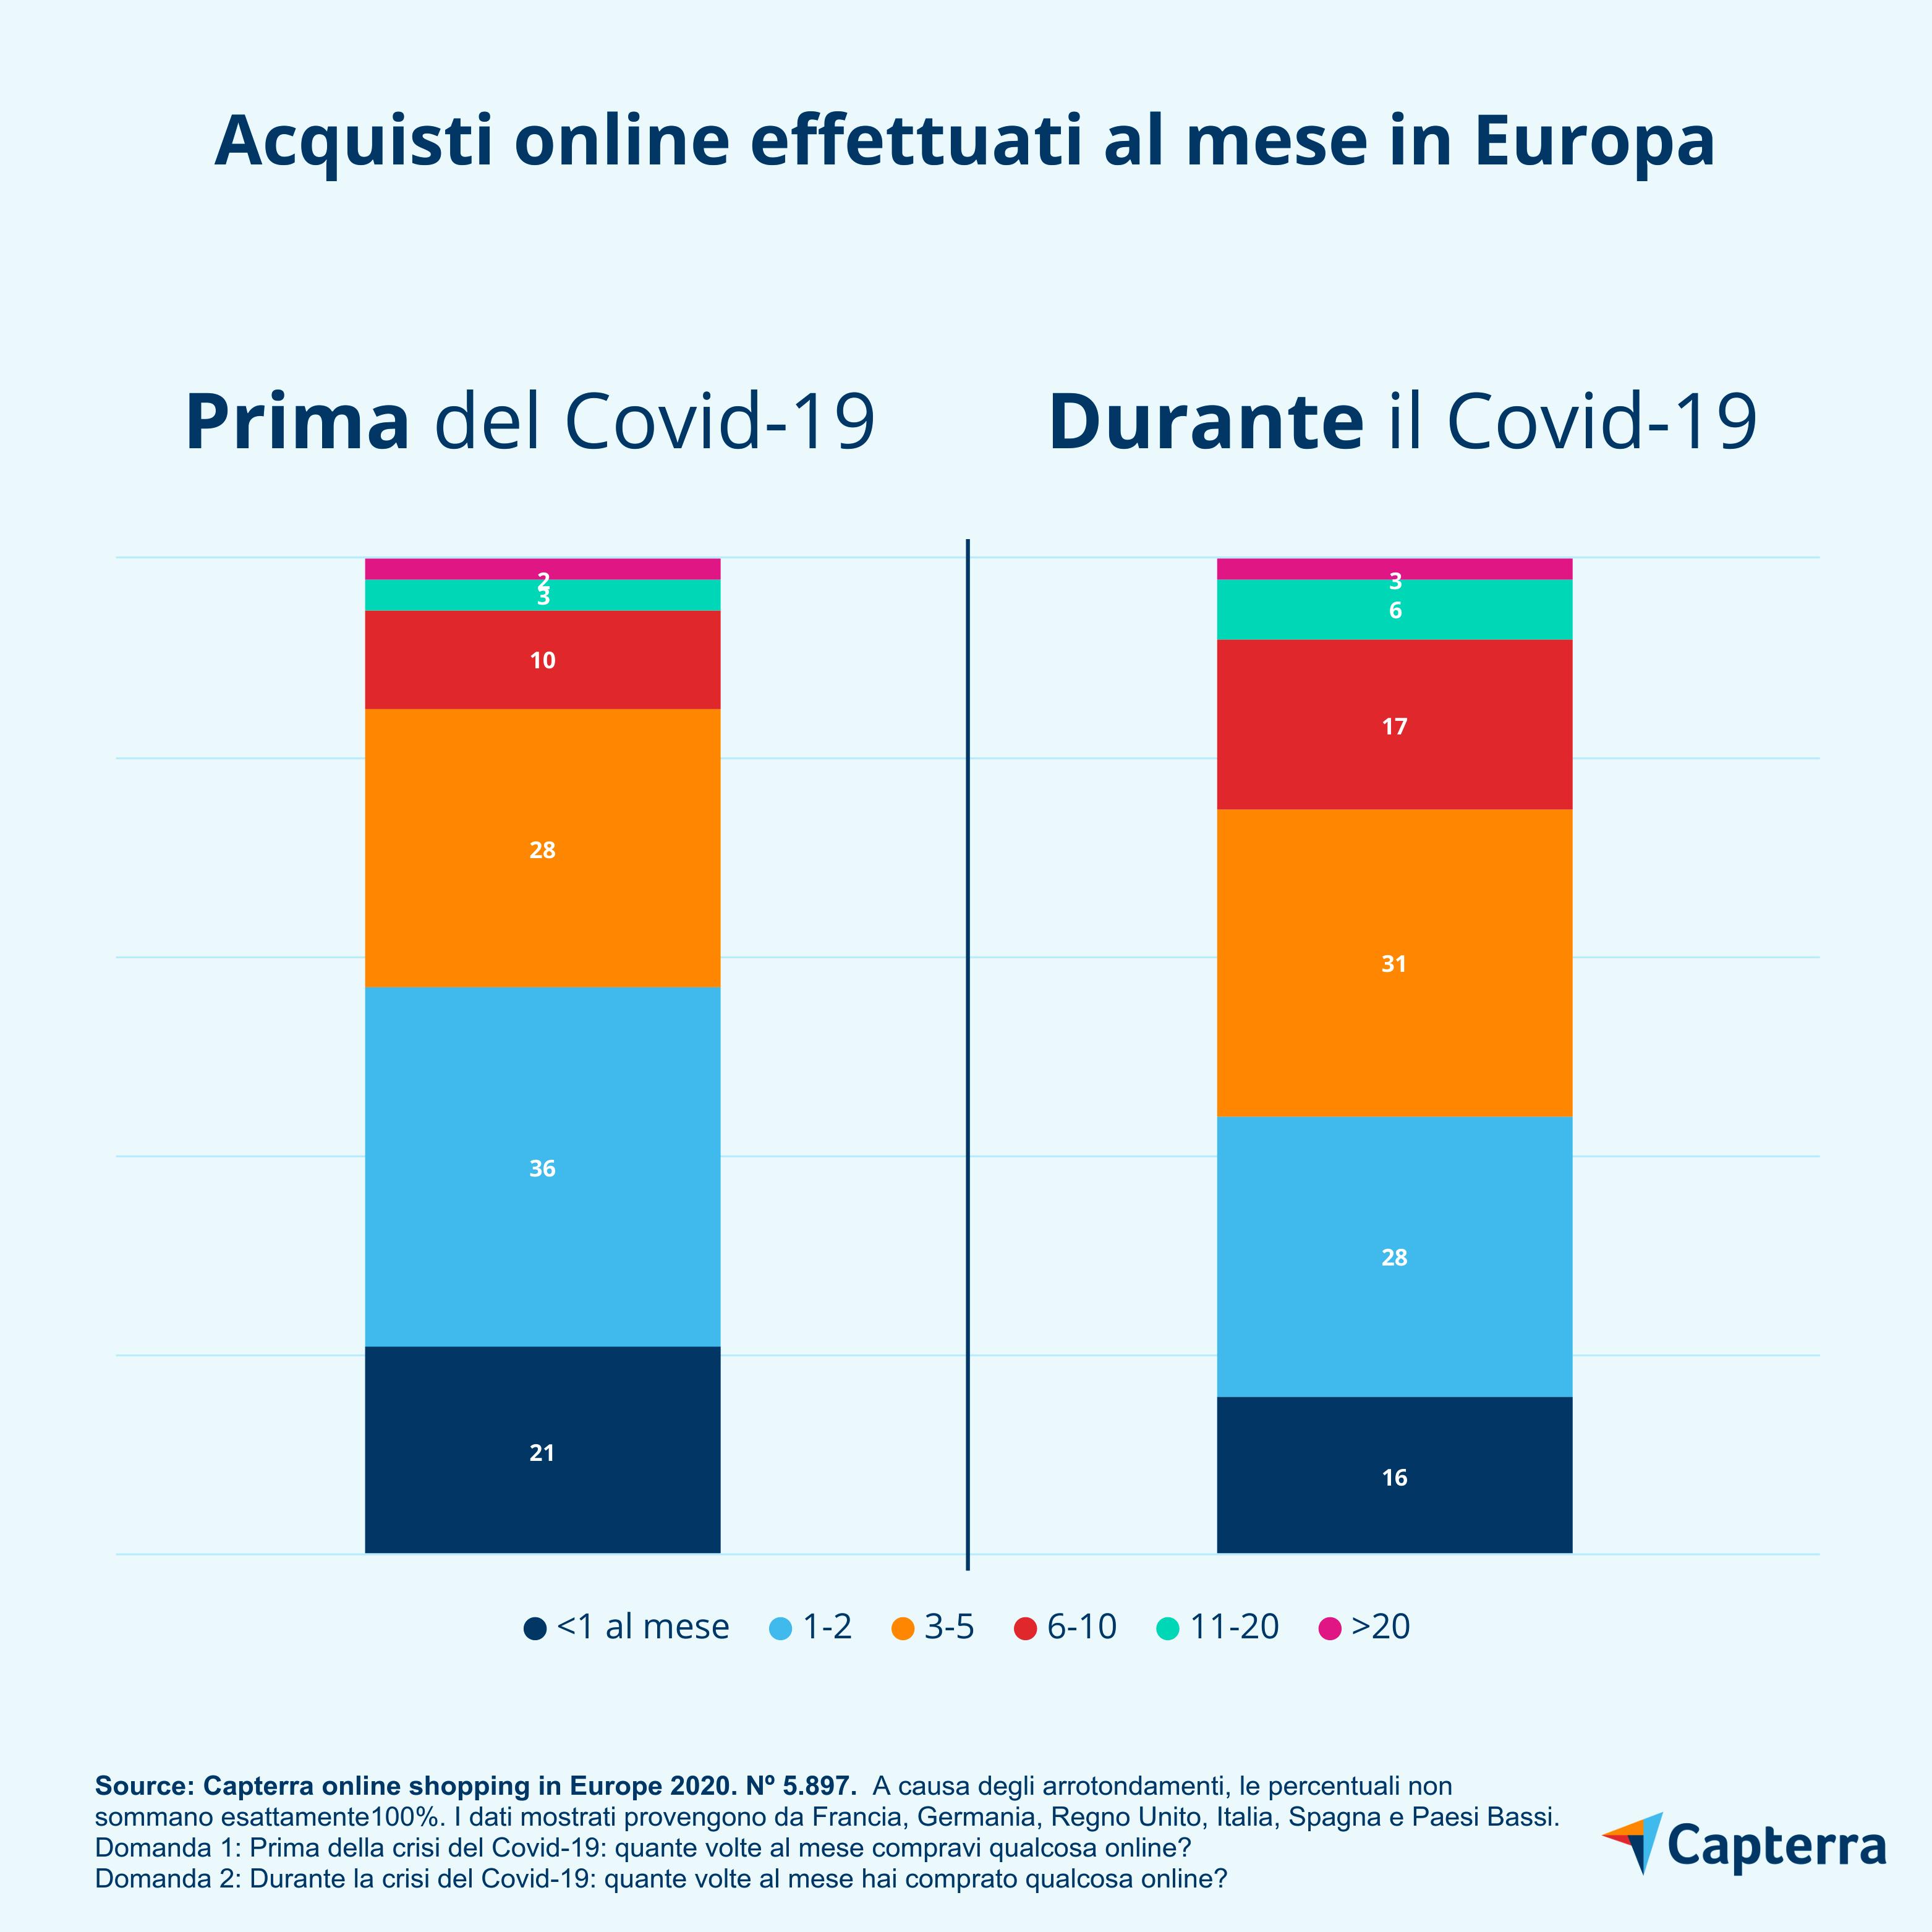 Acquisti online effettuati al mese in Europa